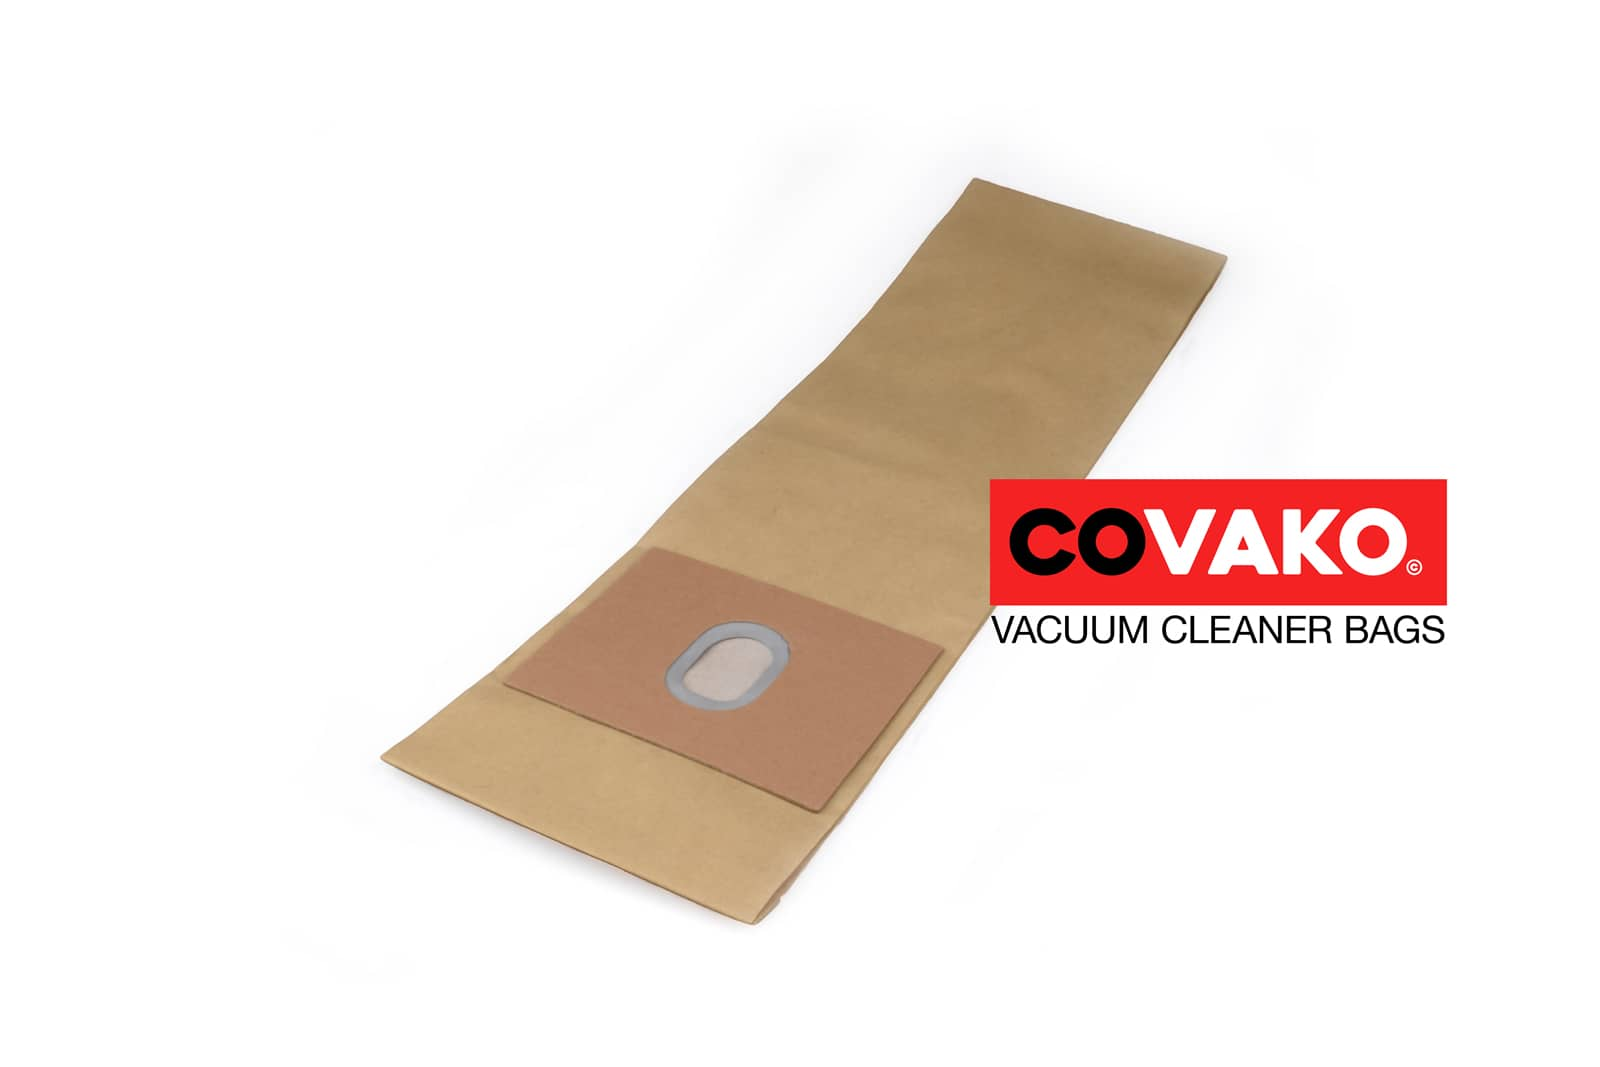 Electrolux L/Z 169-SK 2 / Papier - Electrolux stofzuigerzakken